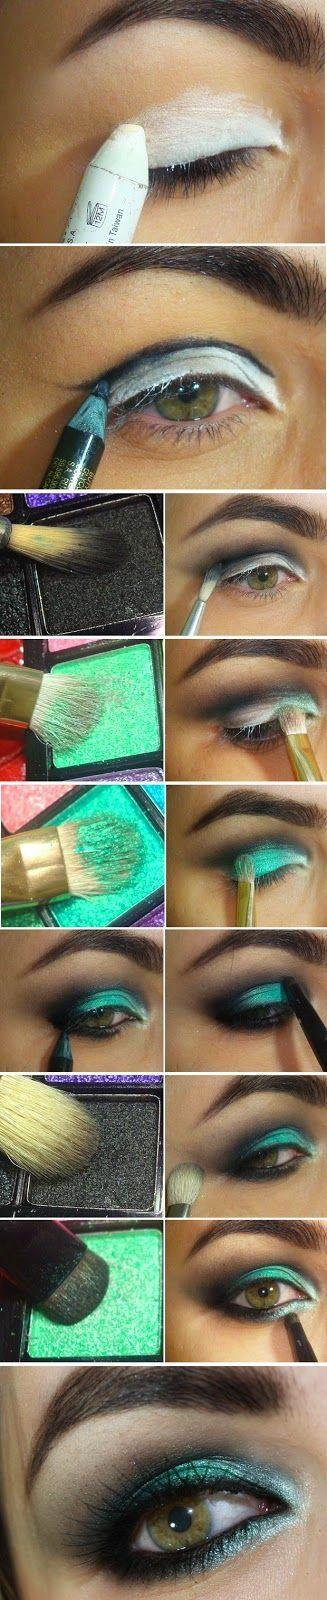 GreenWash Mint Makeup Tutorials | Love Makeup / Best LoLus Makeup Fashion: